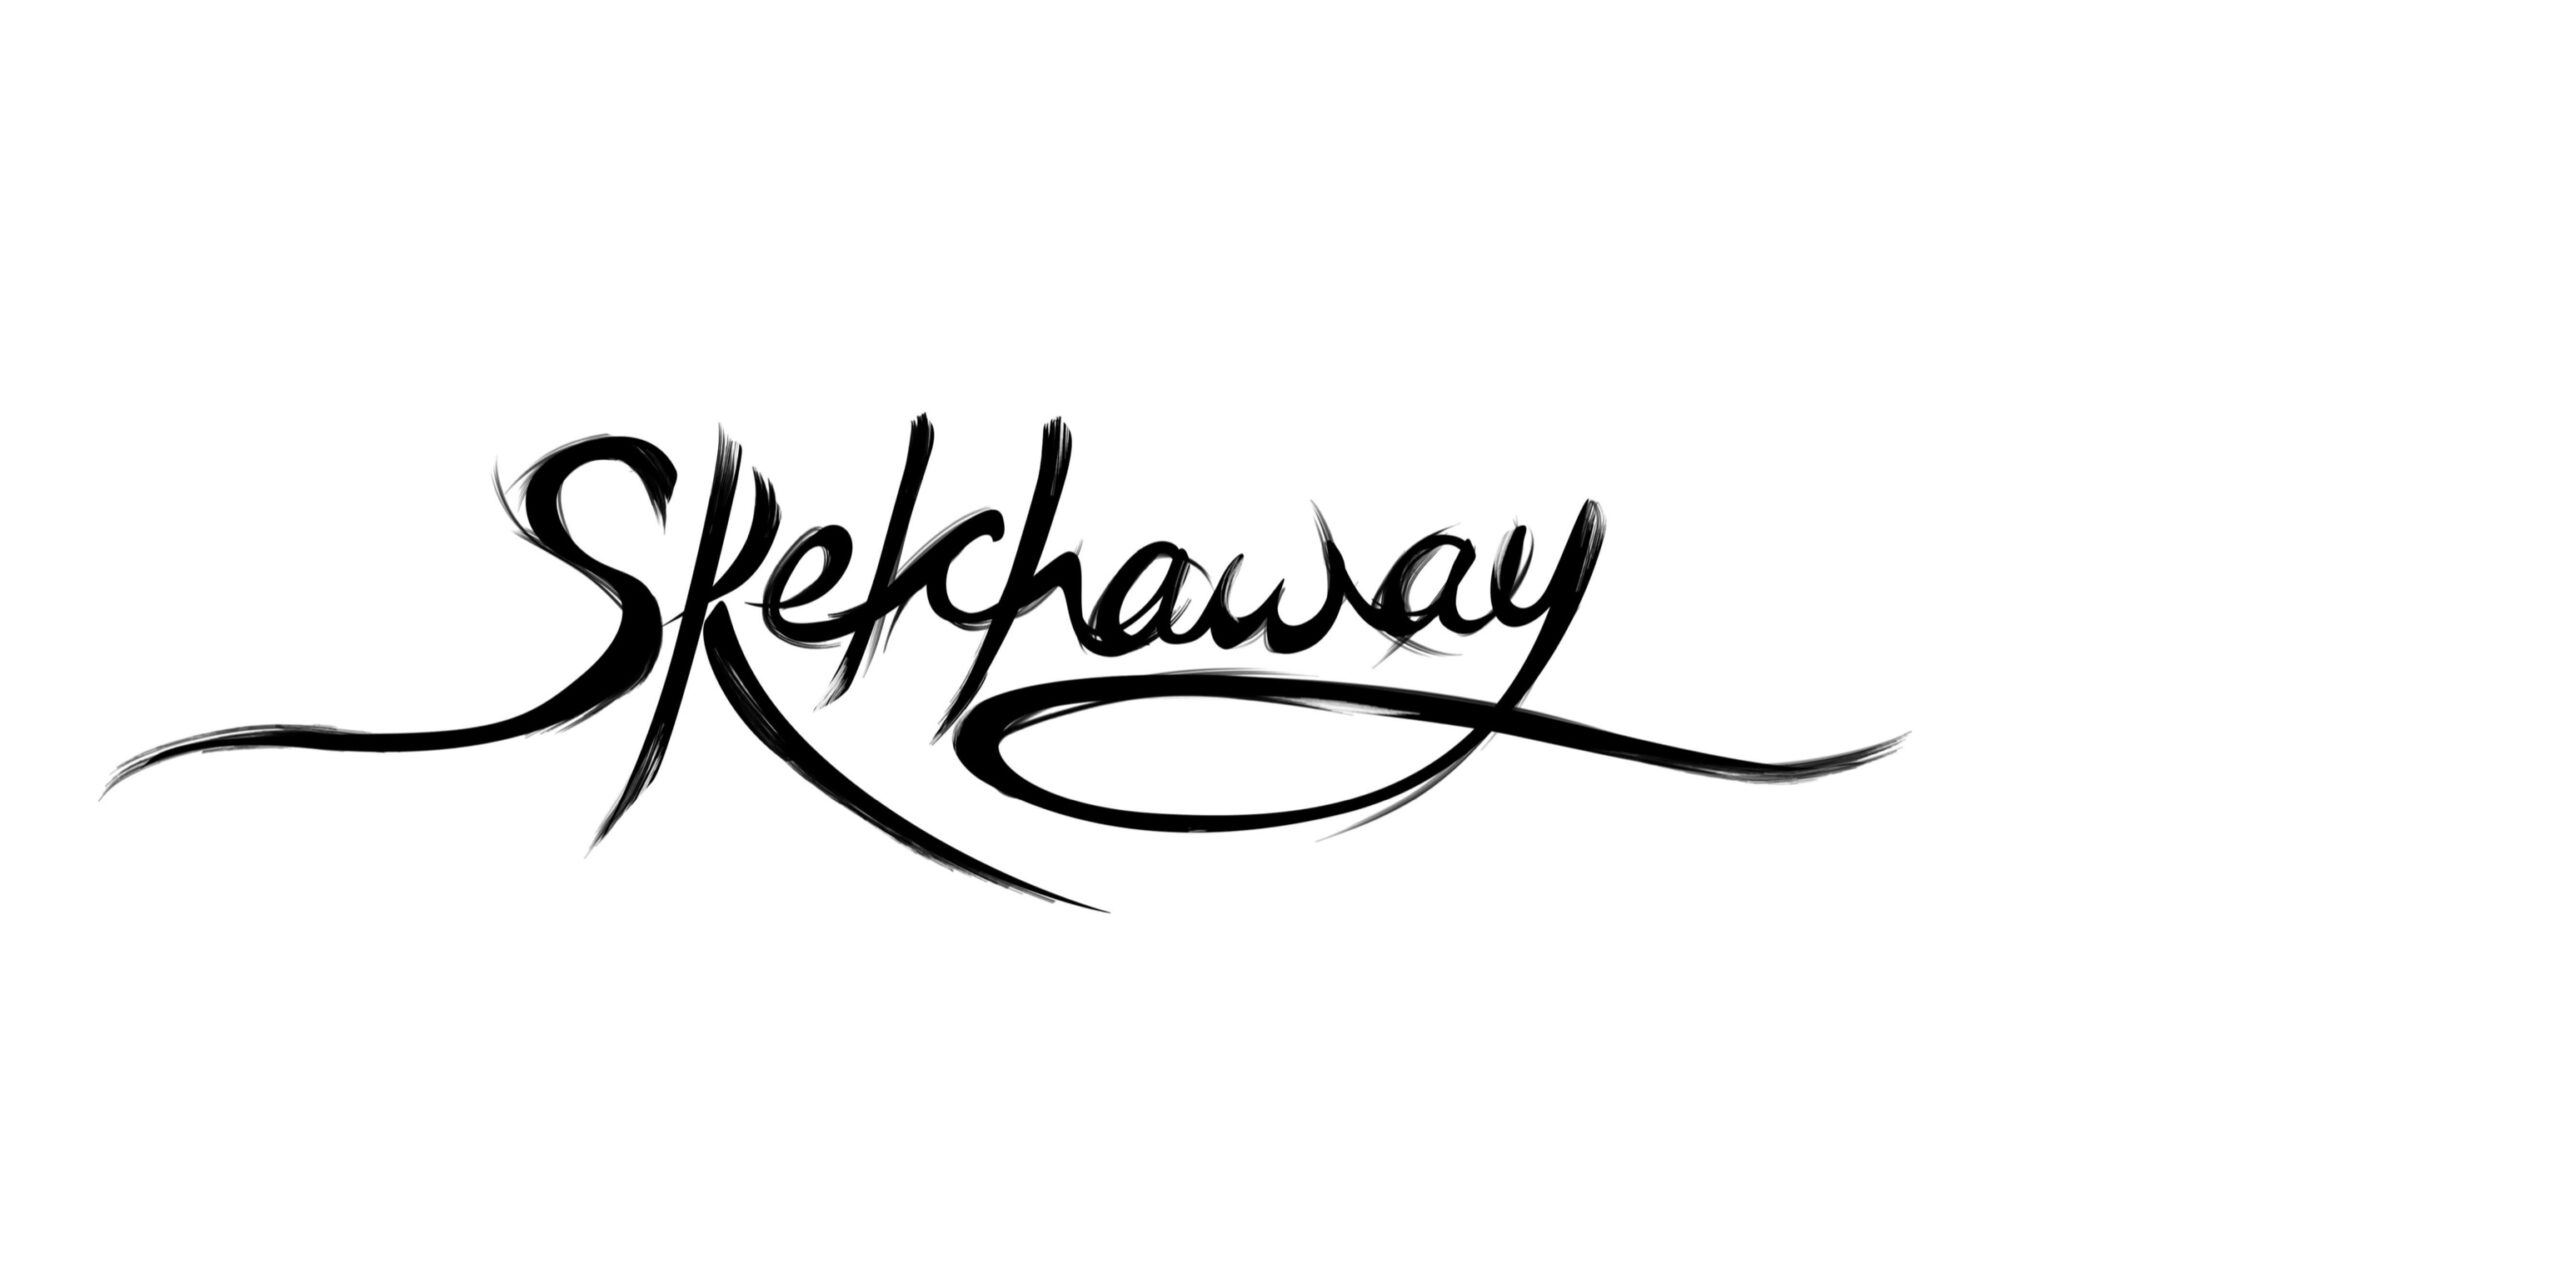 Sketchaway